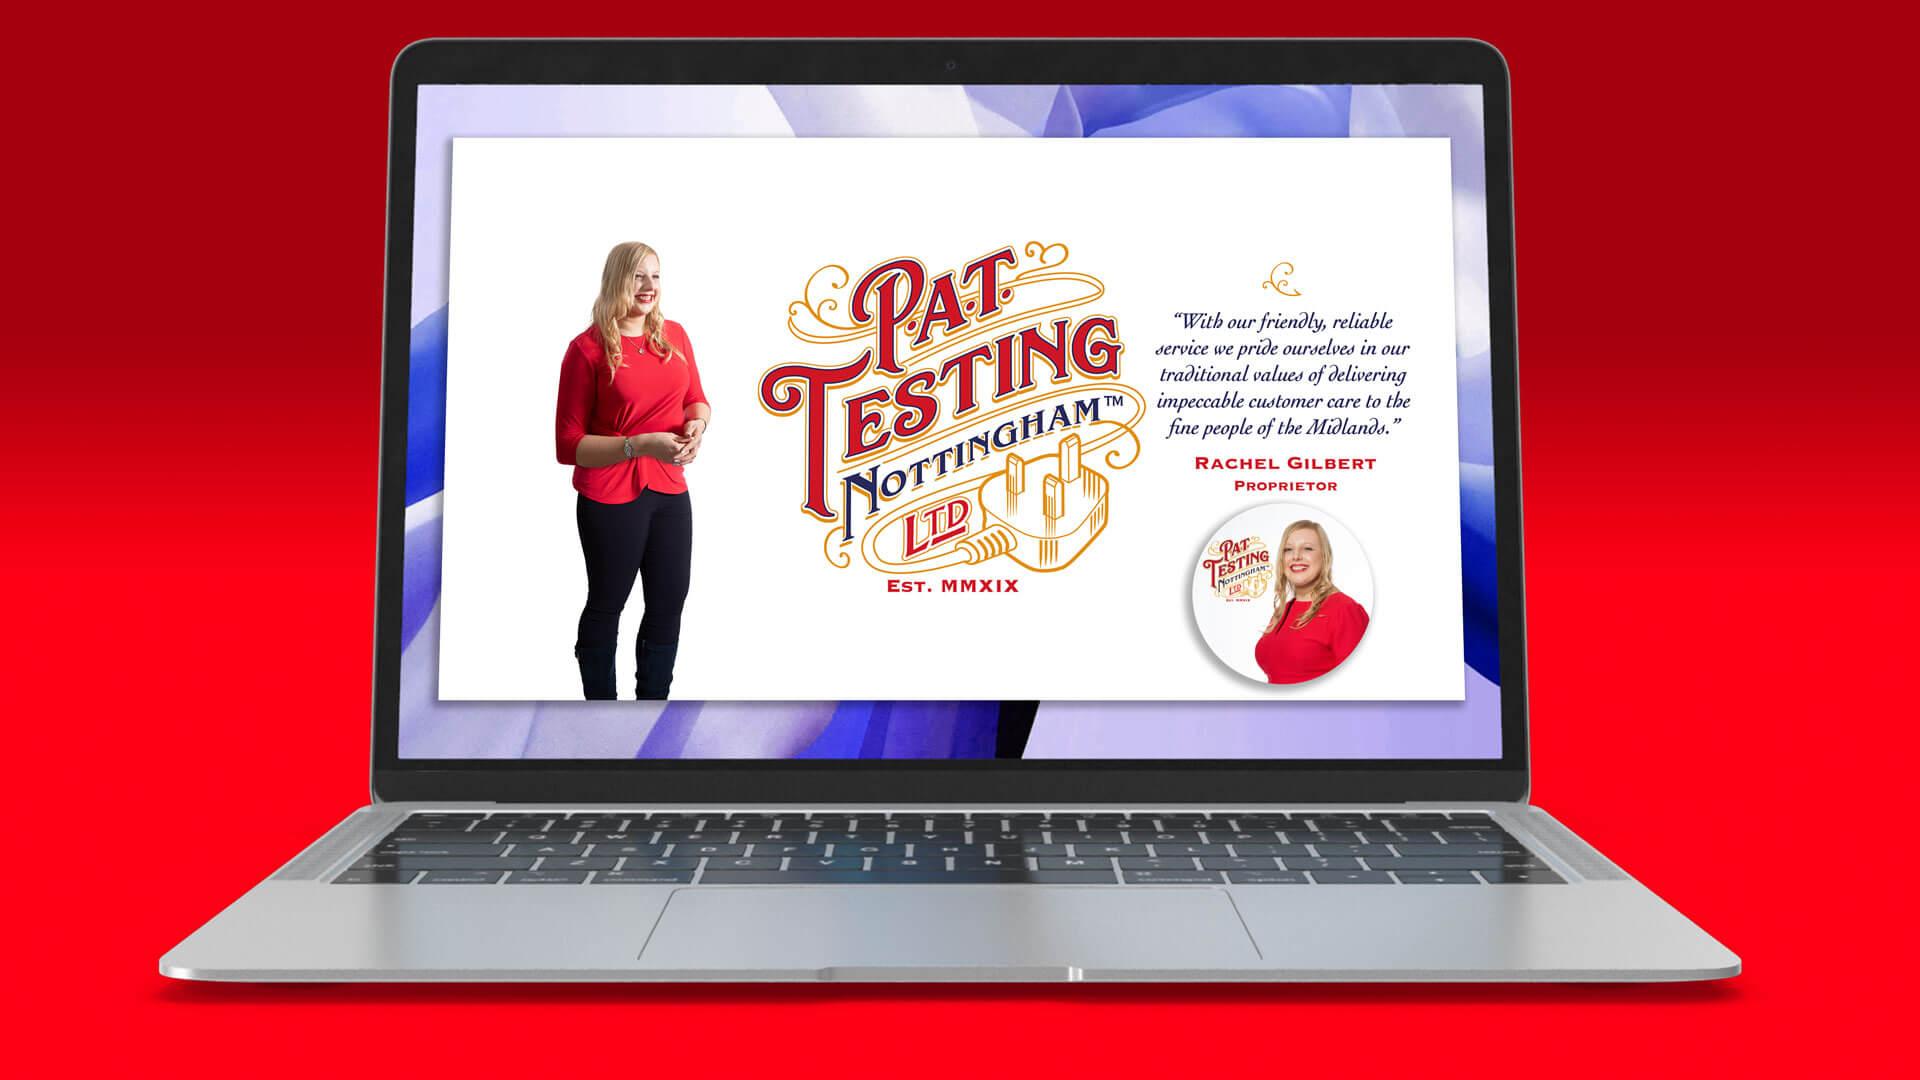 pat testing nottingham 3